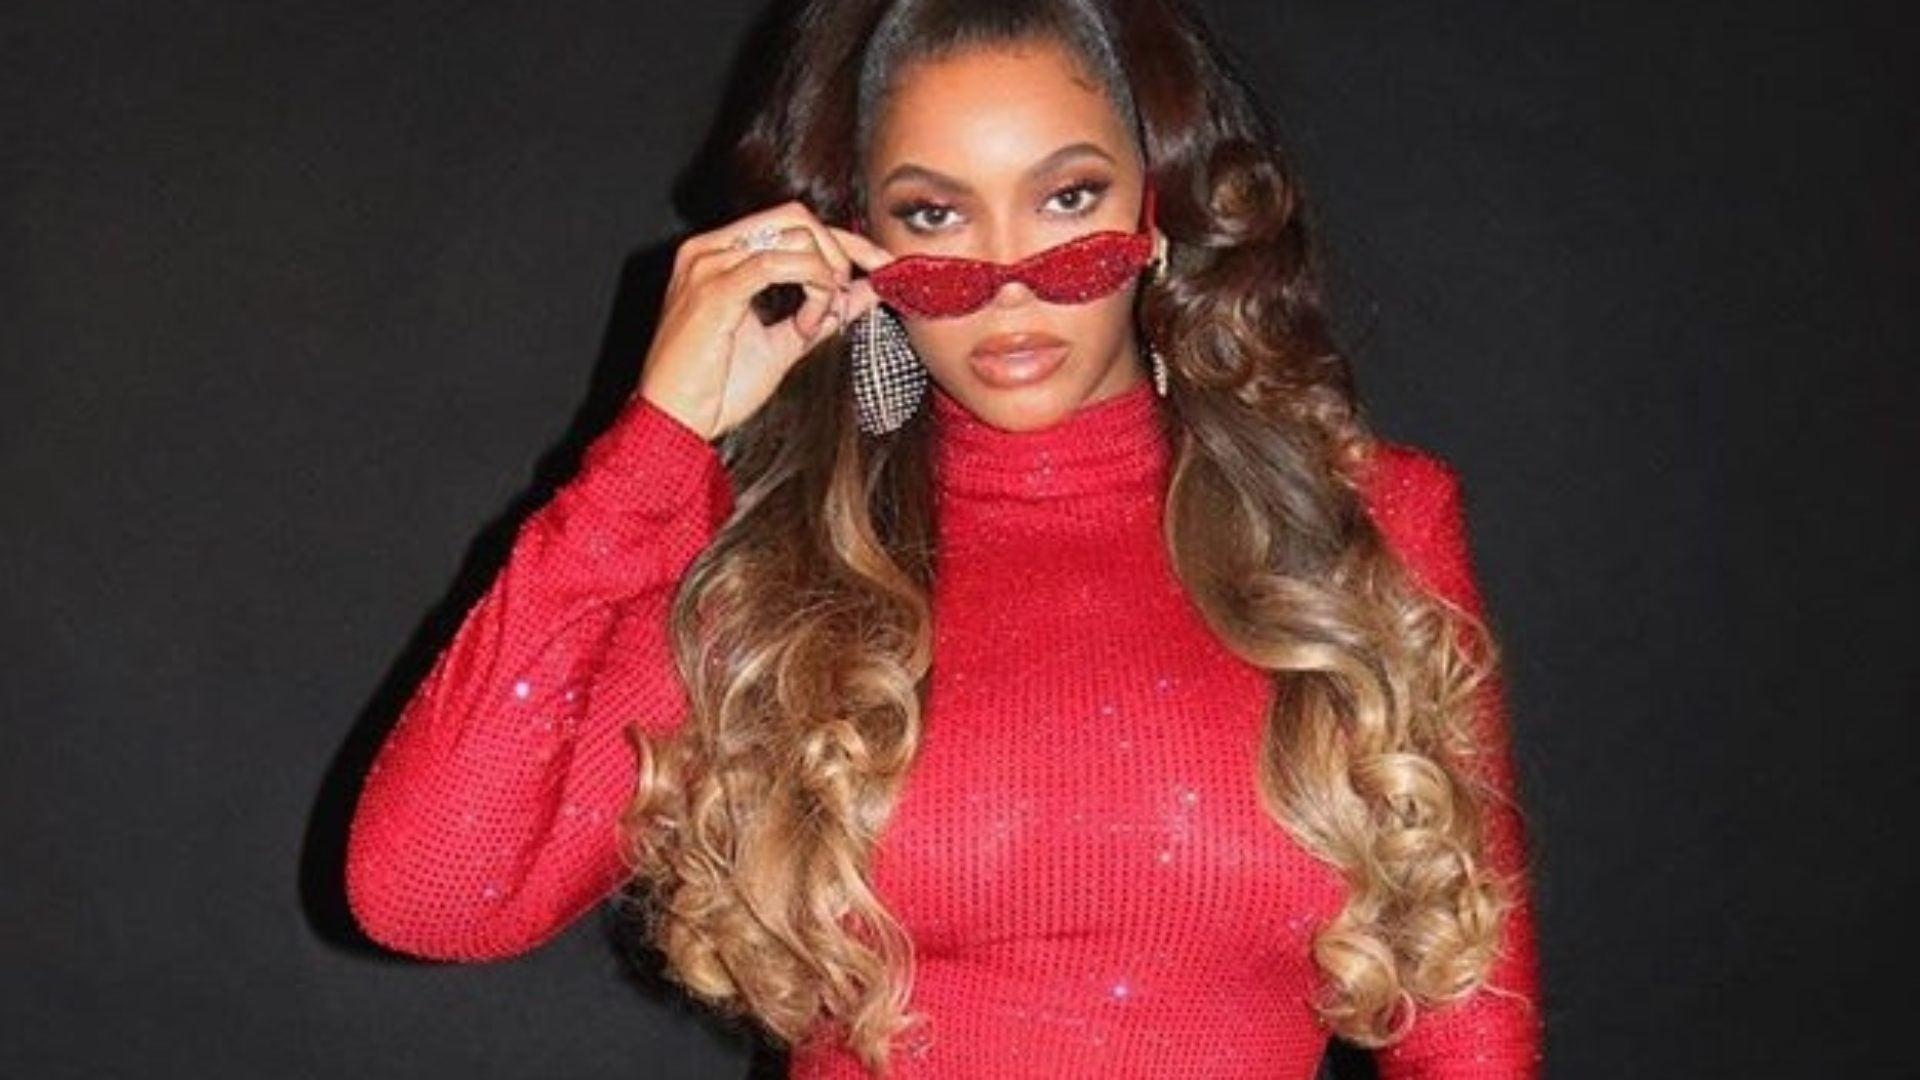 'Beyoncé Is Not Performing In Ghana,' Her Publicist Confirms After 'Year Of Return' Rumors